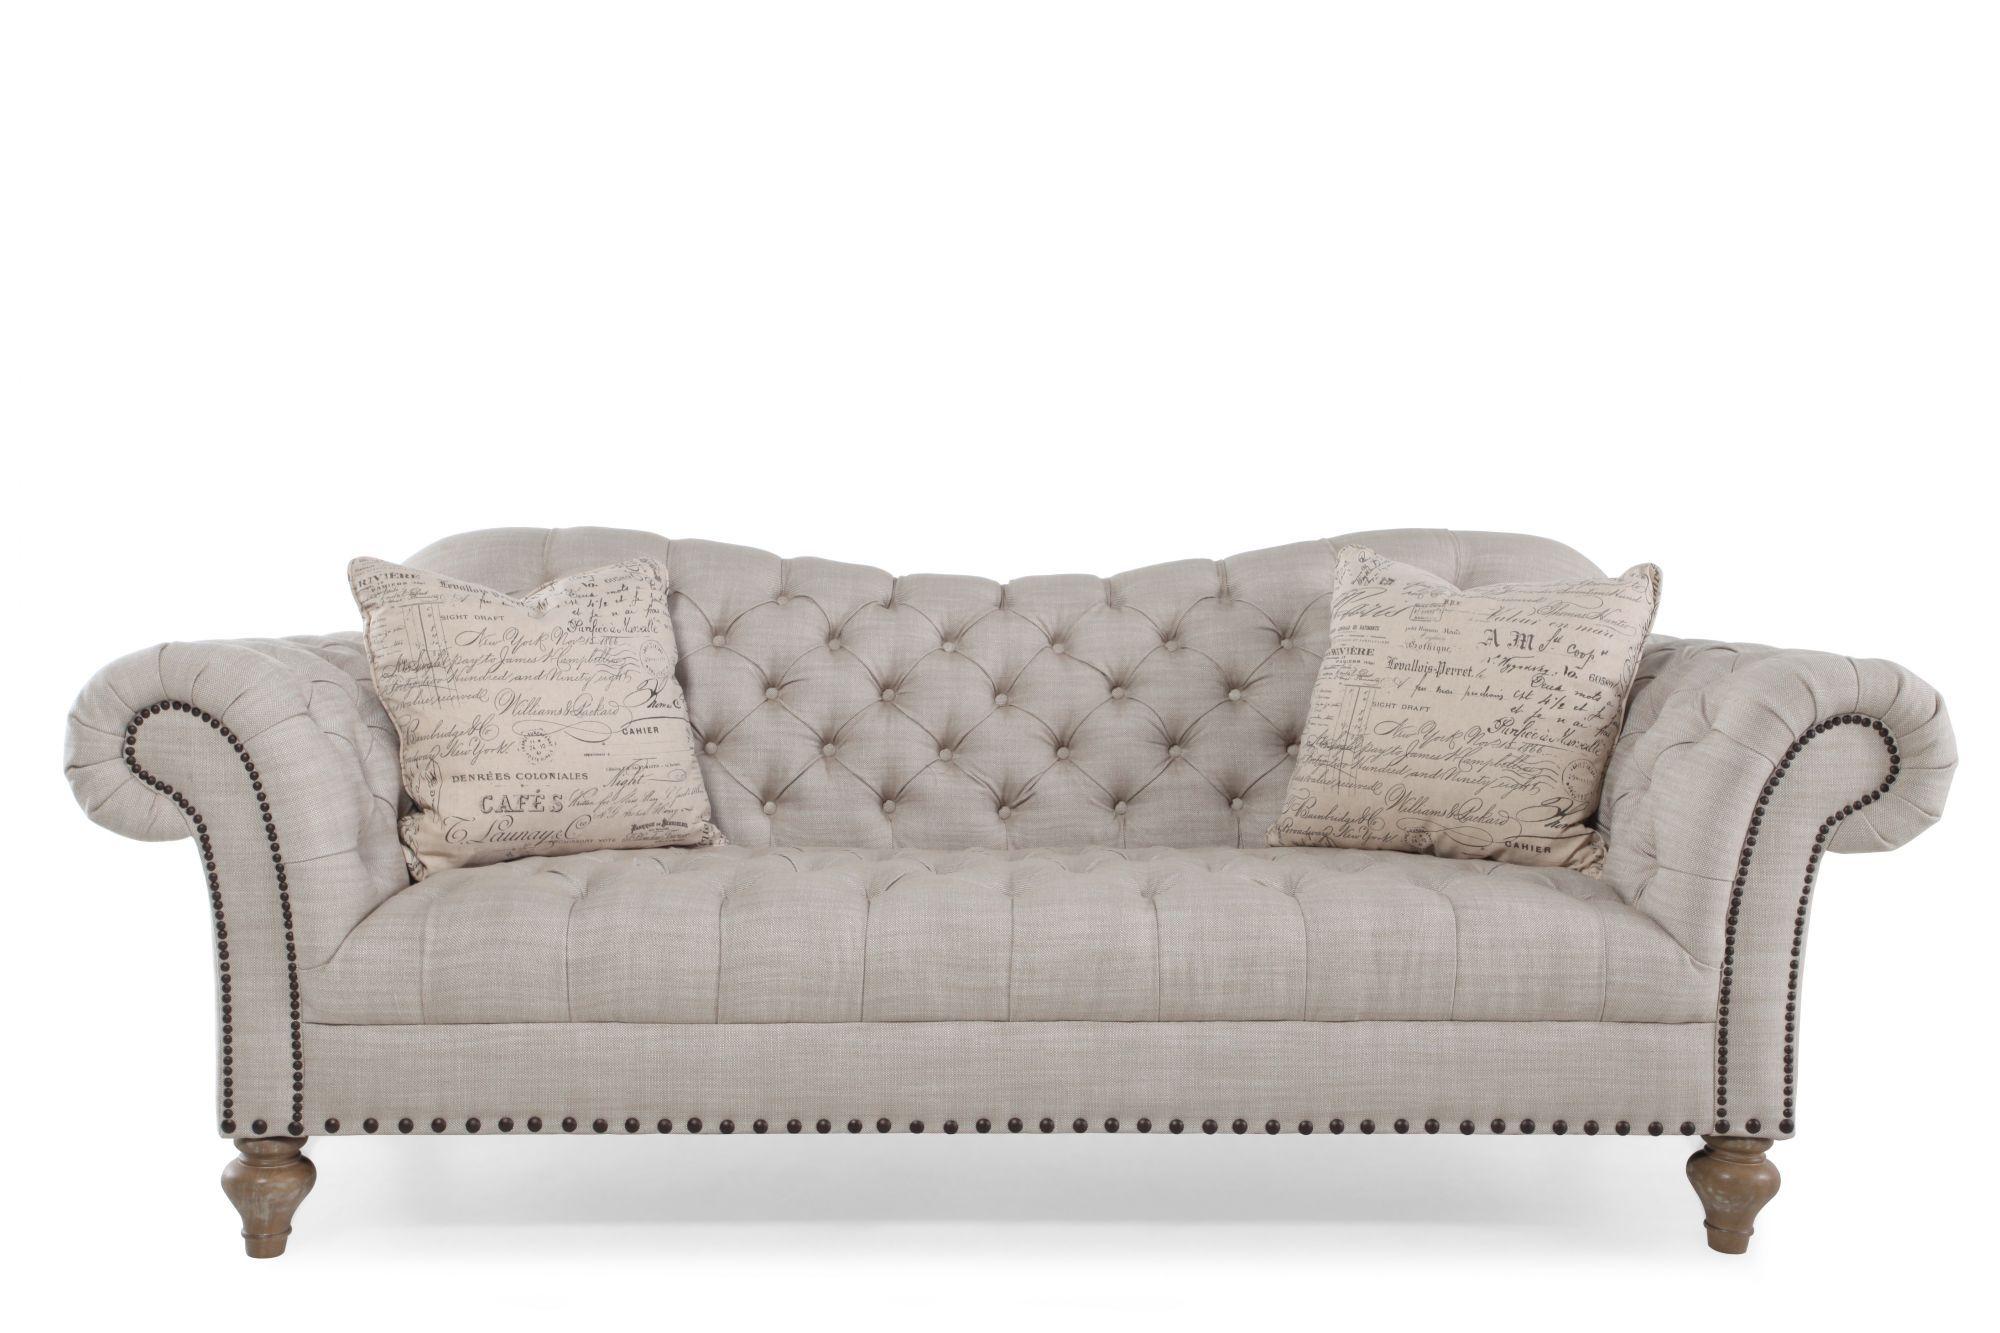 Rachlin Classics Vanna Linen Fabric Sofa Mathis Brothers